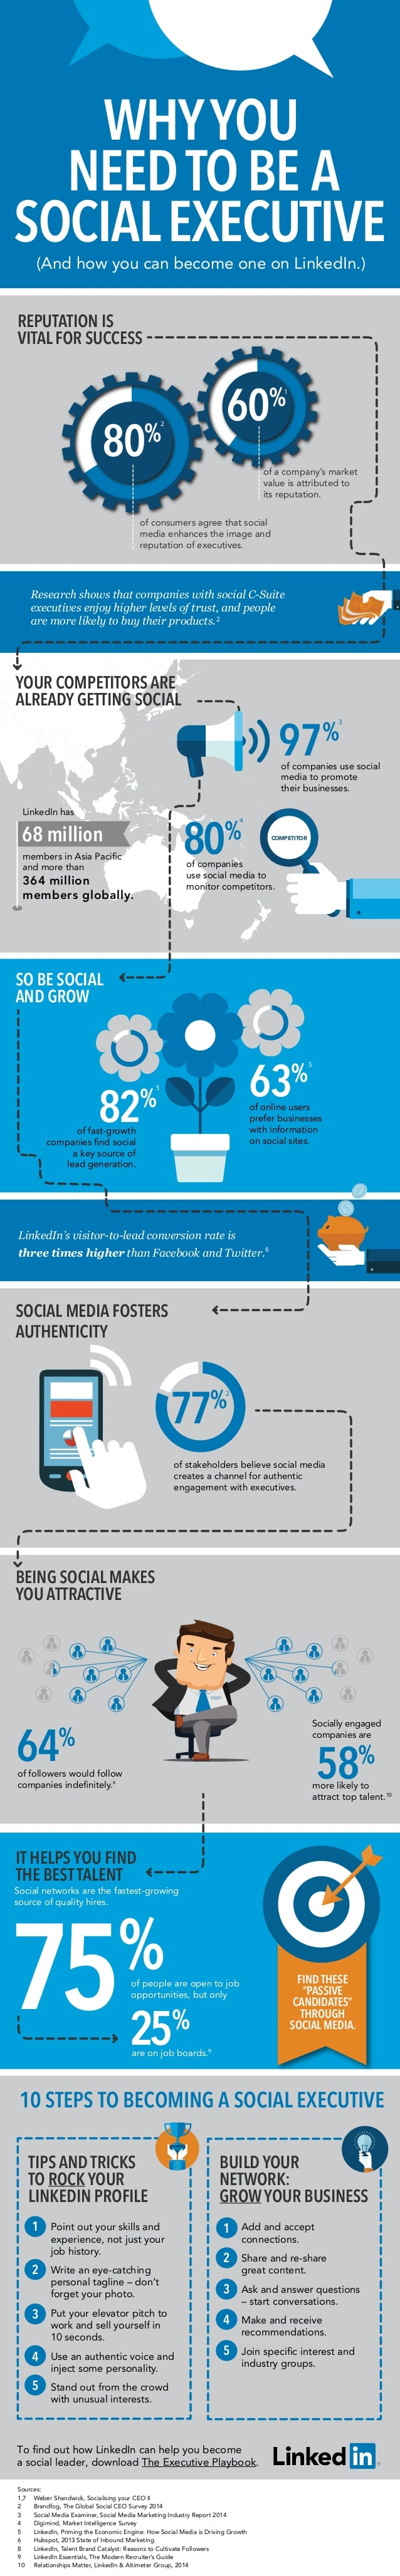 how executives can be social